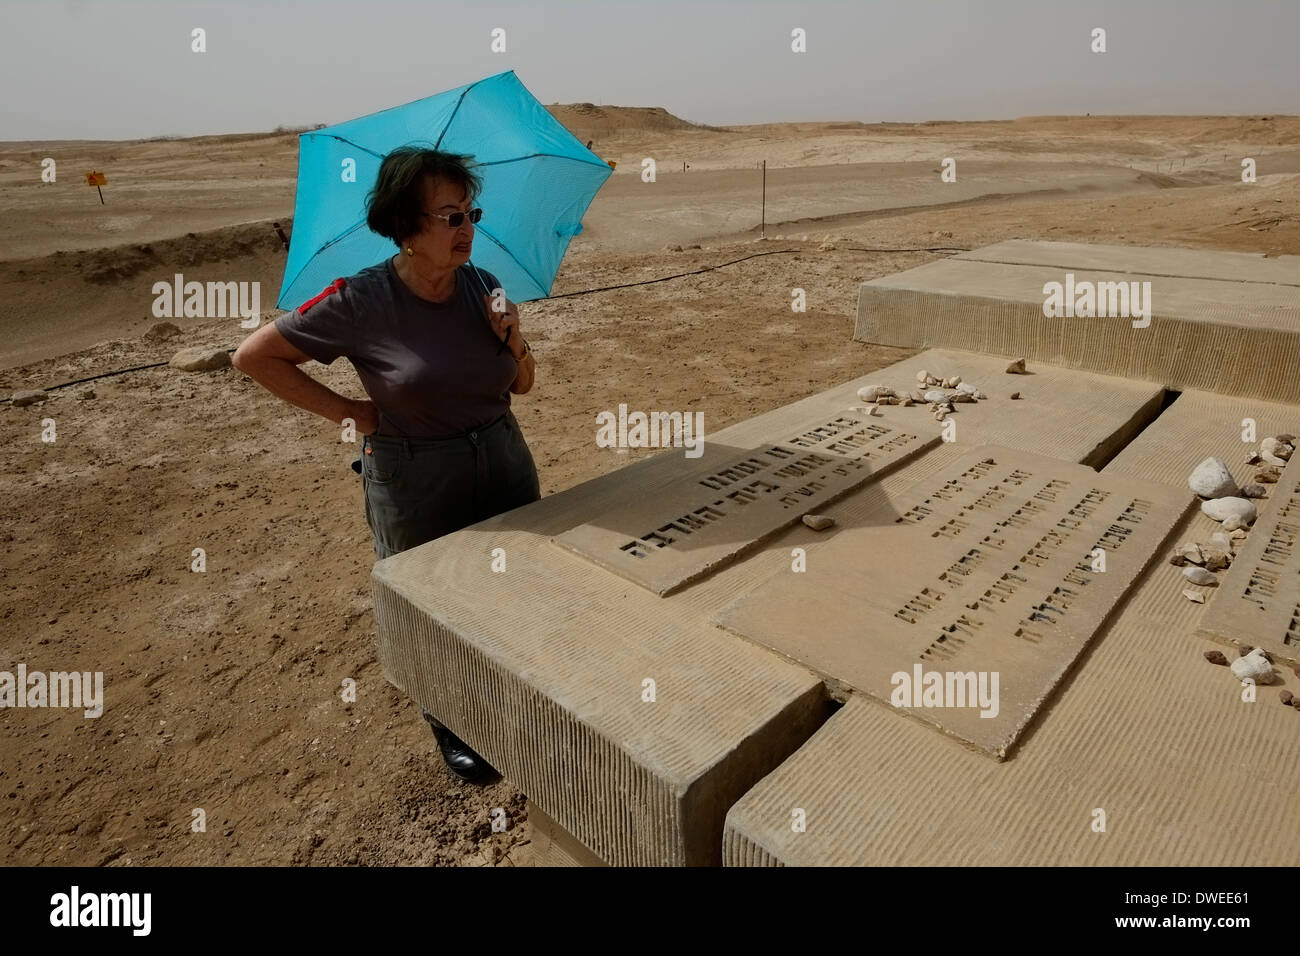 A memorial site near Jericho commemorating Israeli Beit Haarava pioneer settlers in the 1930s in the Jordan valley Stock Photo